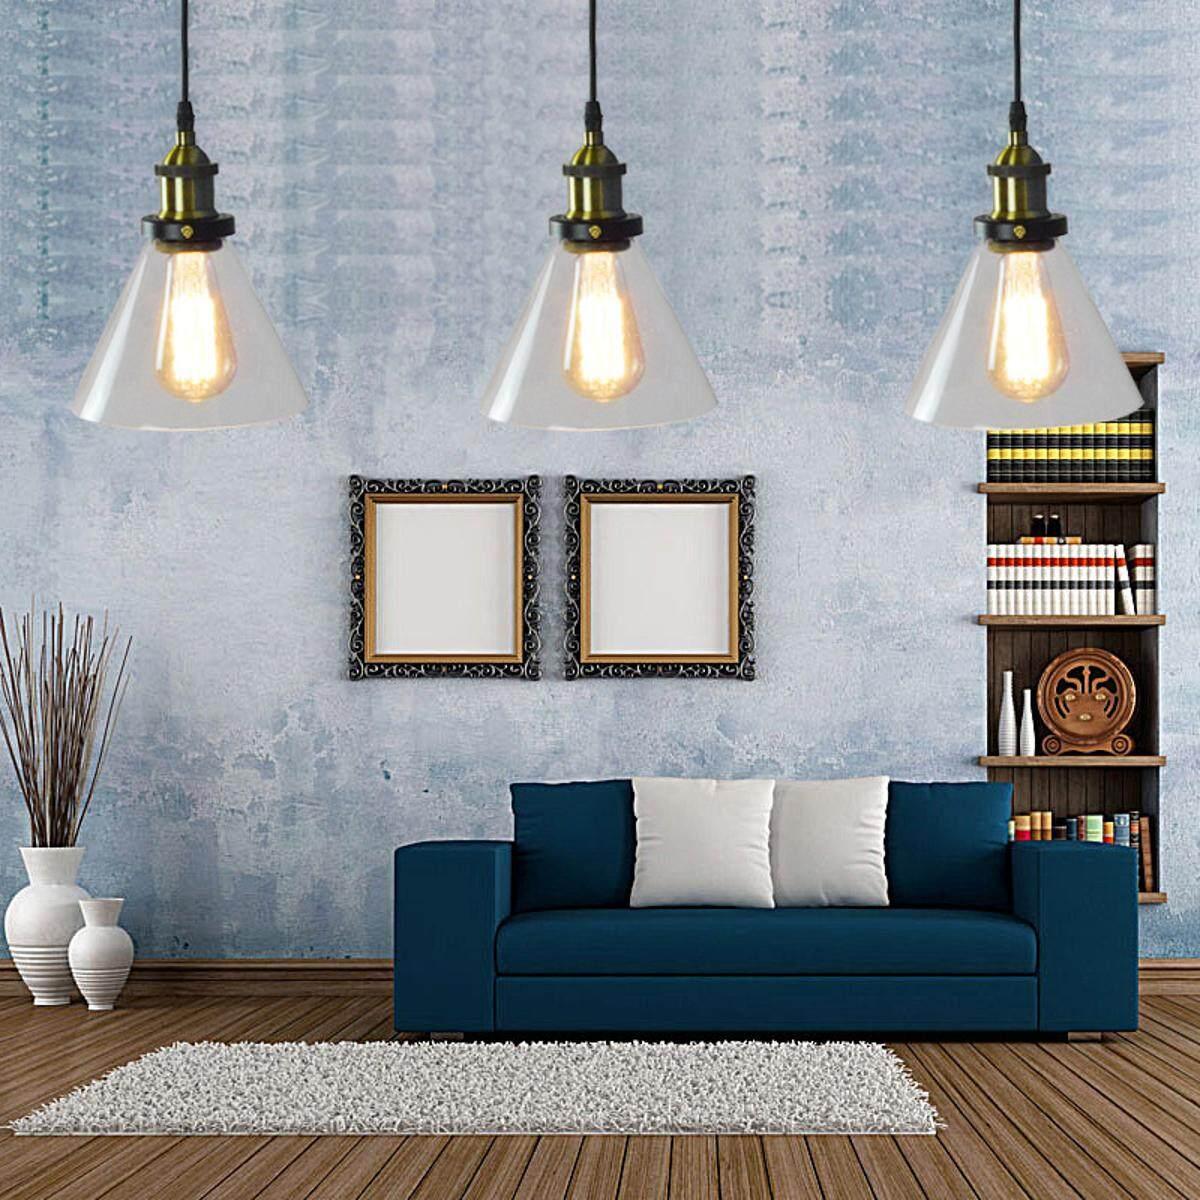 Glass Shade Vintage Industrial Fitting Ceiling Pendant Light Chandelier Bar Lamp